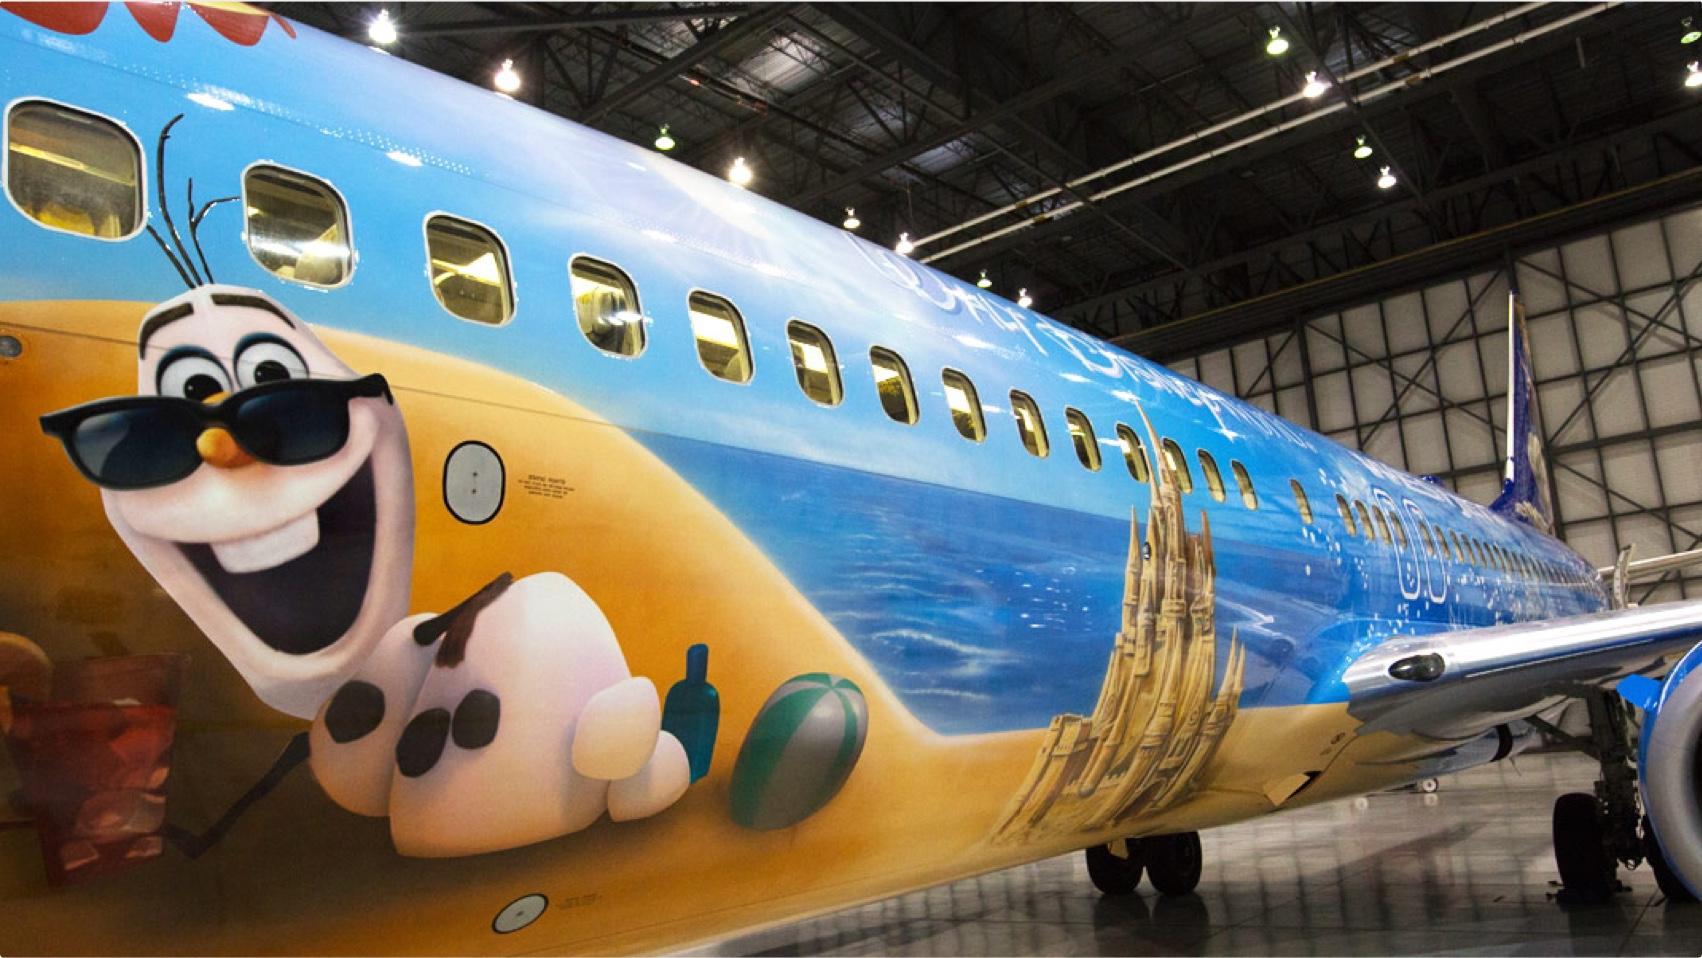 Aircraft of the Month WestJet Frozen Plane & Aircraft of the Month: WestJet Frozen Plane | YVR